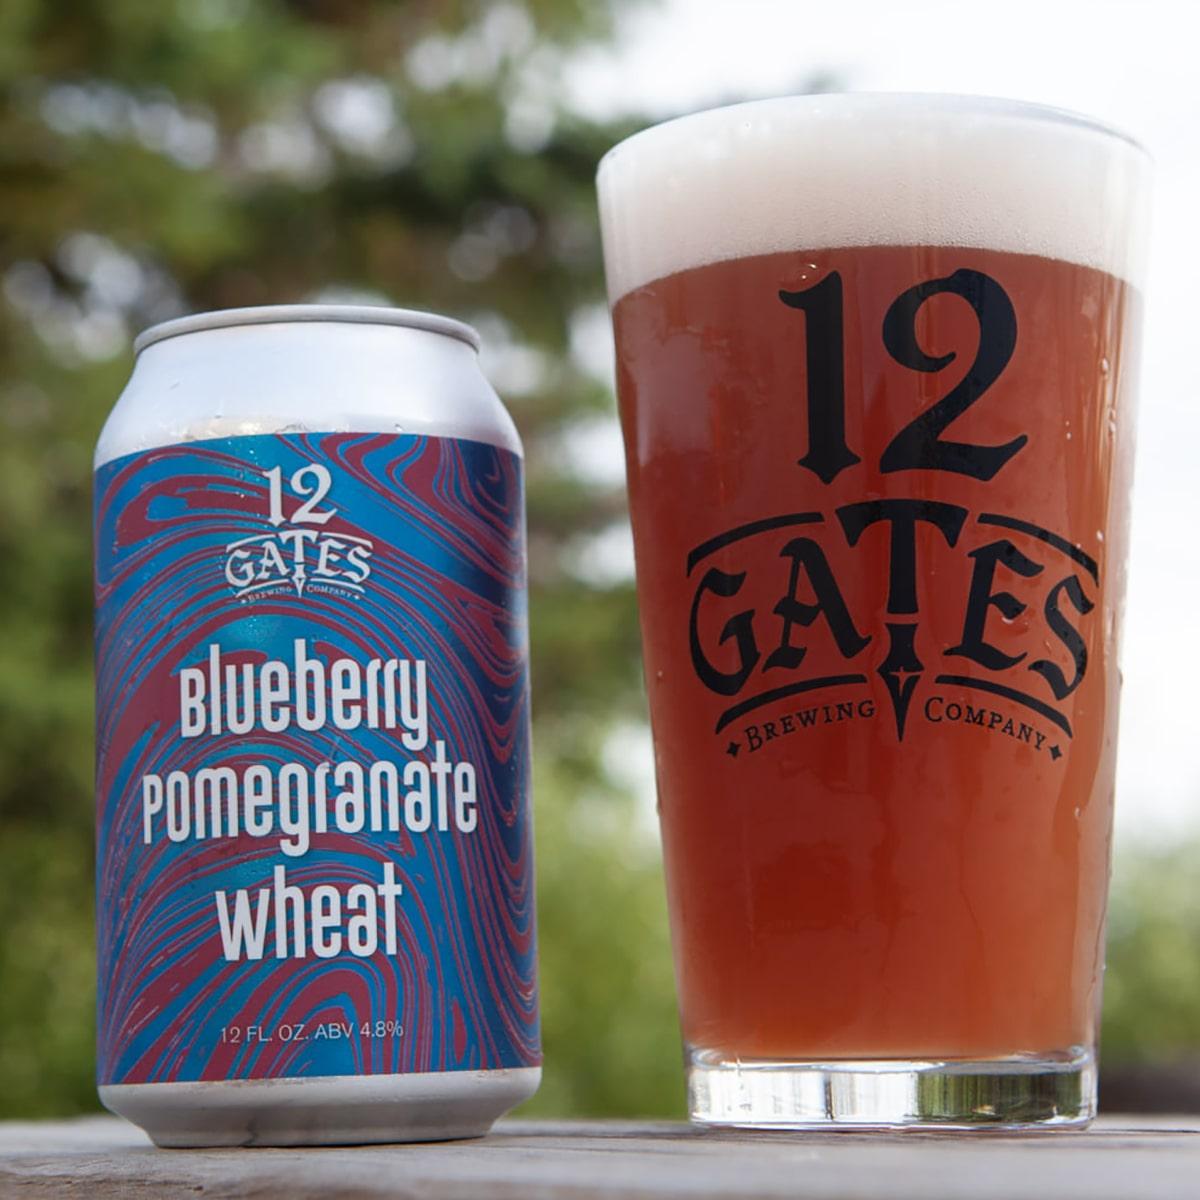 Blueberry Pomegranate Wheat - American Wheat Ale - 12 Gates - Buffalocal